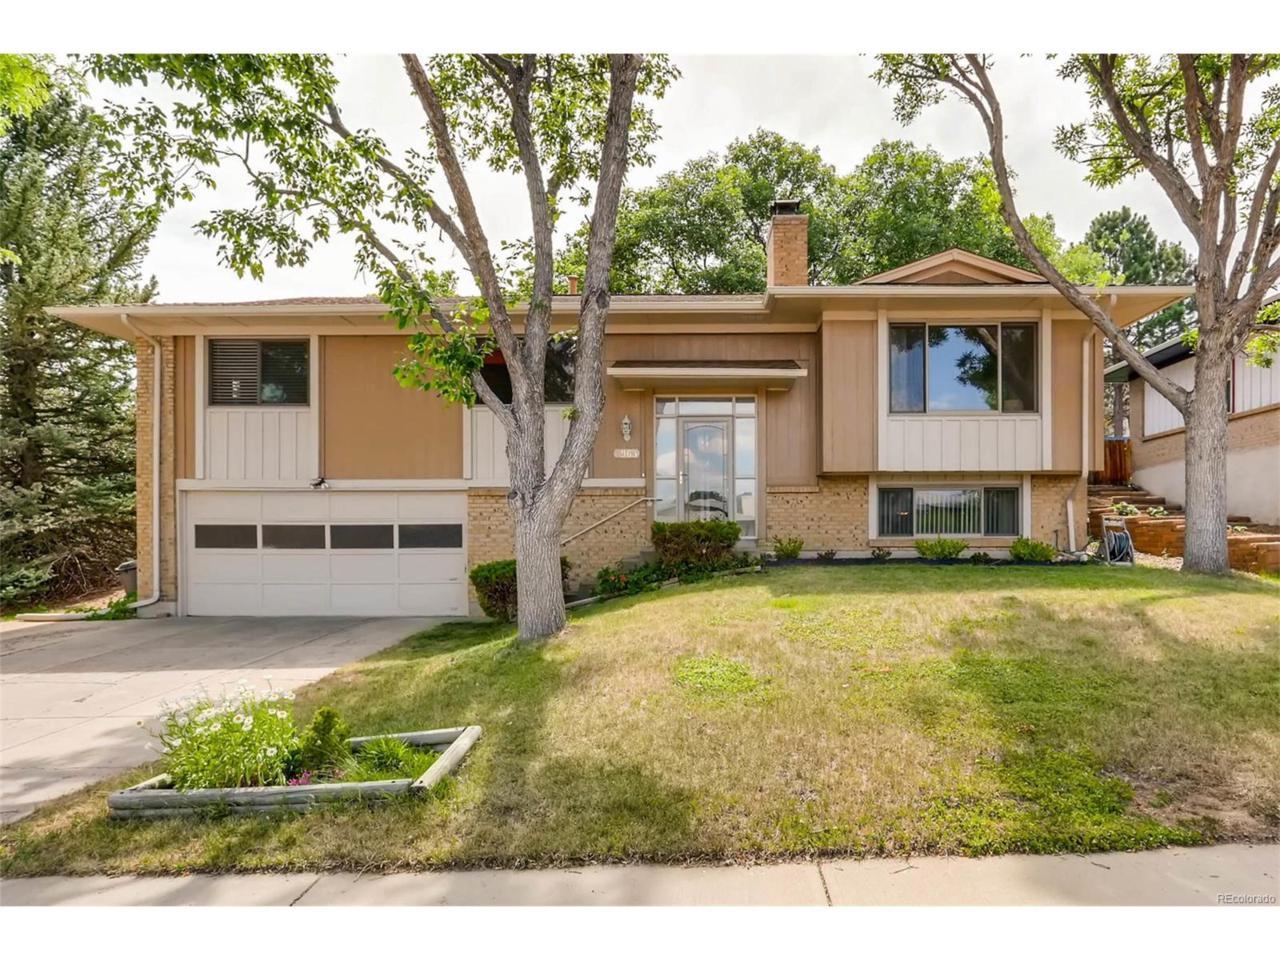 1963 S Xenon Street, Lakewood, CO 80228 (MLS #8092560) :: 8z Real Estate